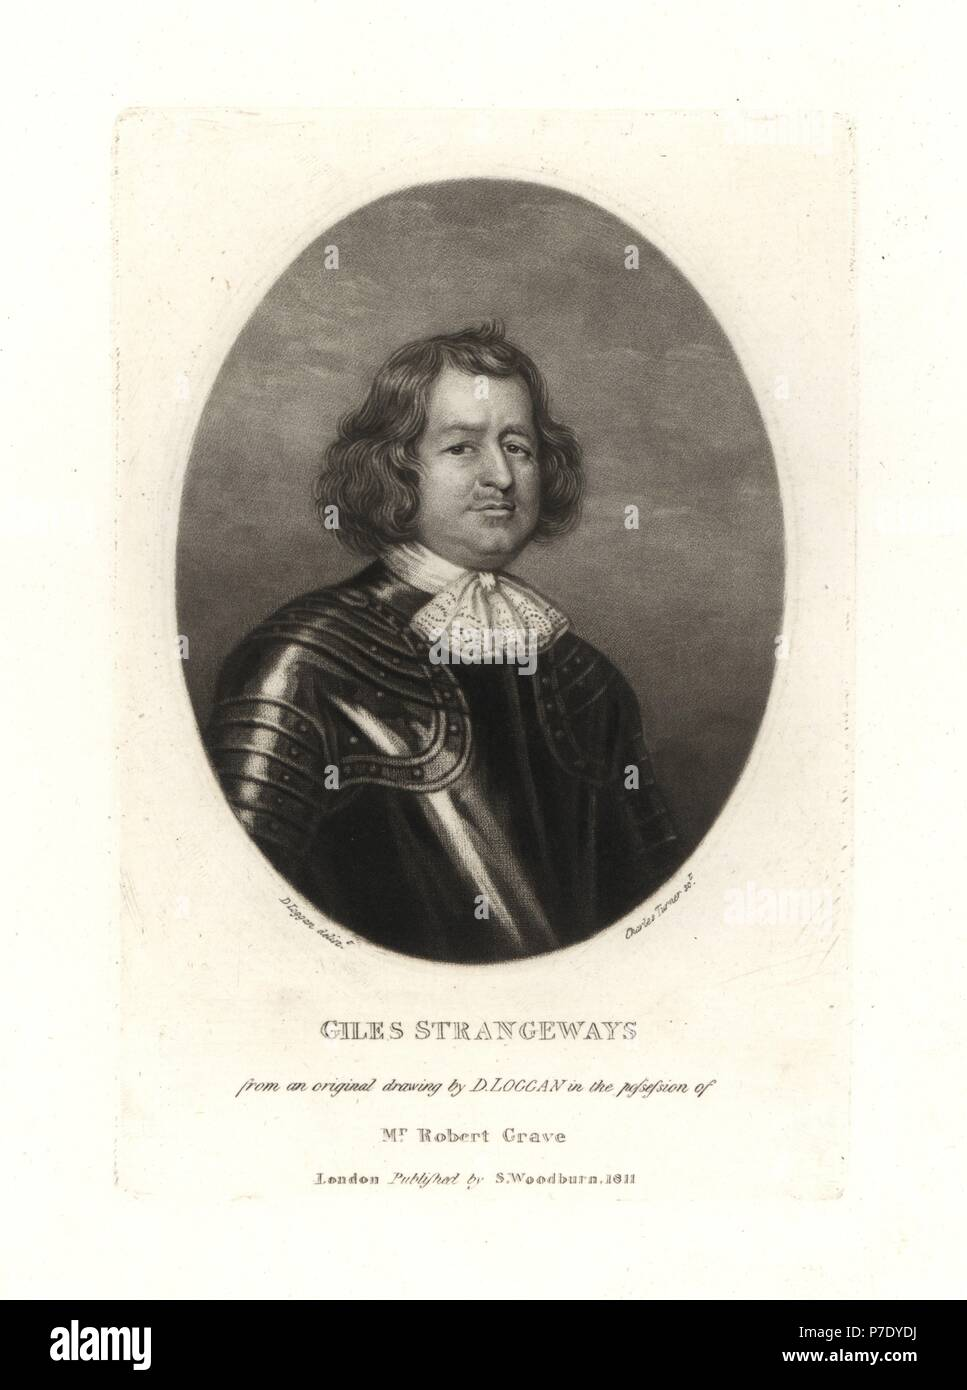 Giles Strangeways Royalist Politico Morì 1675 Copperplate